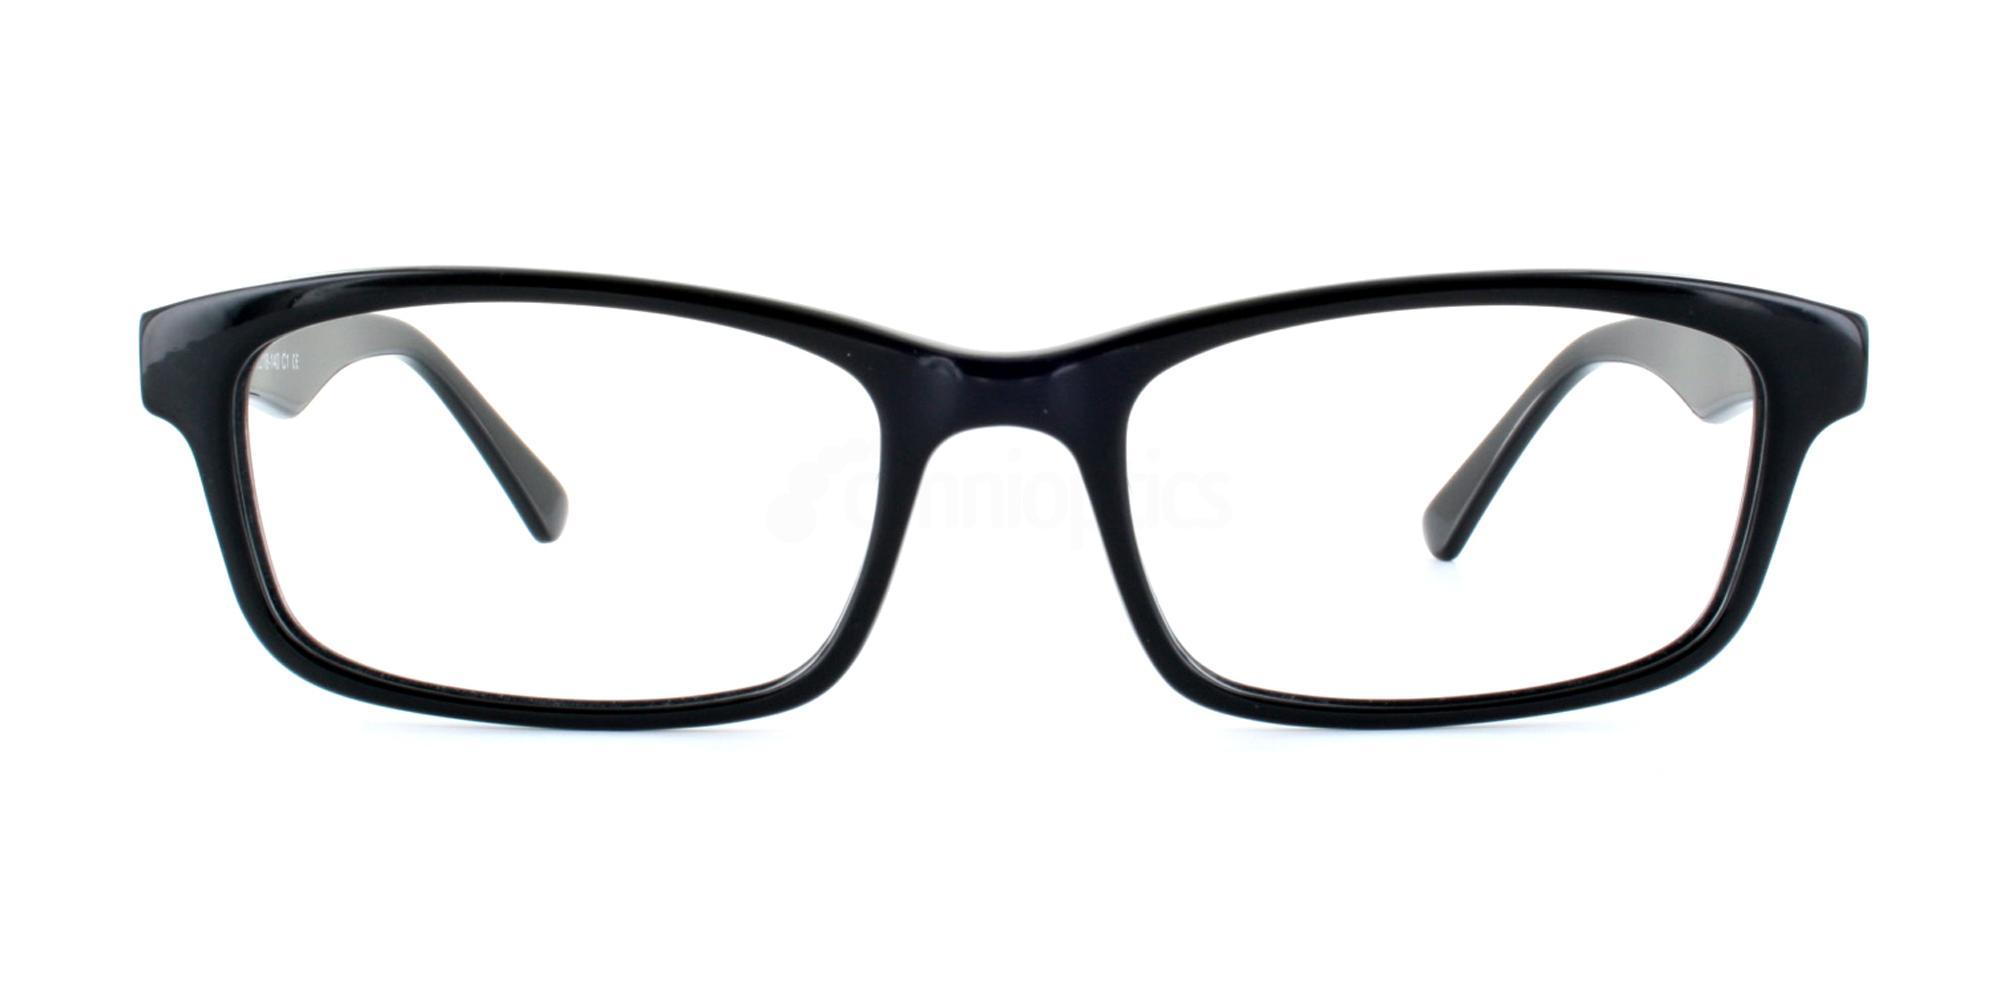 C1 A9915 Glasses, SelectSpecs